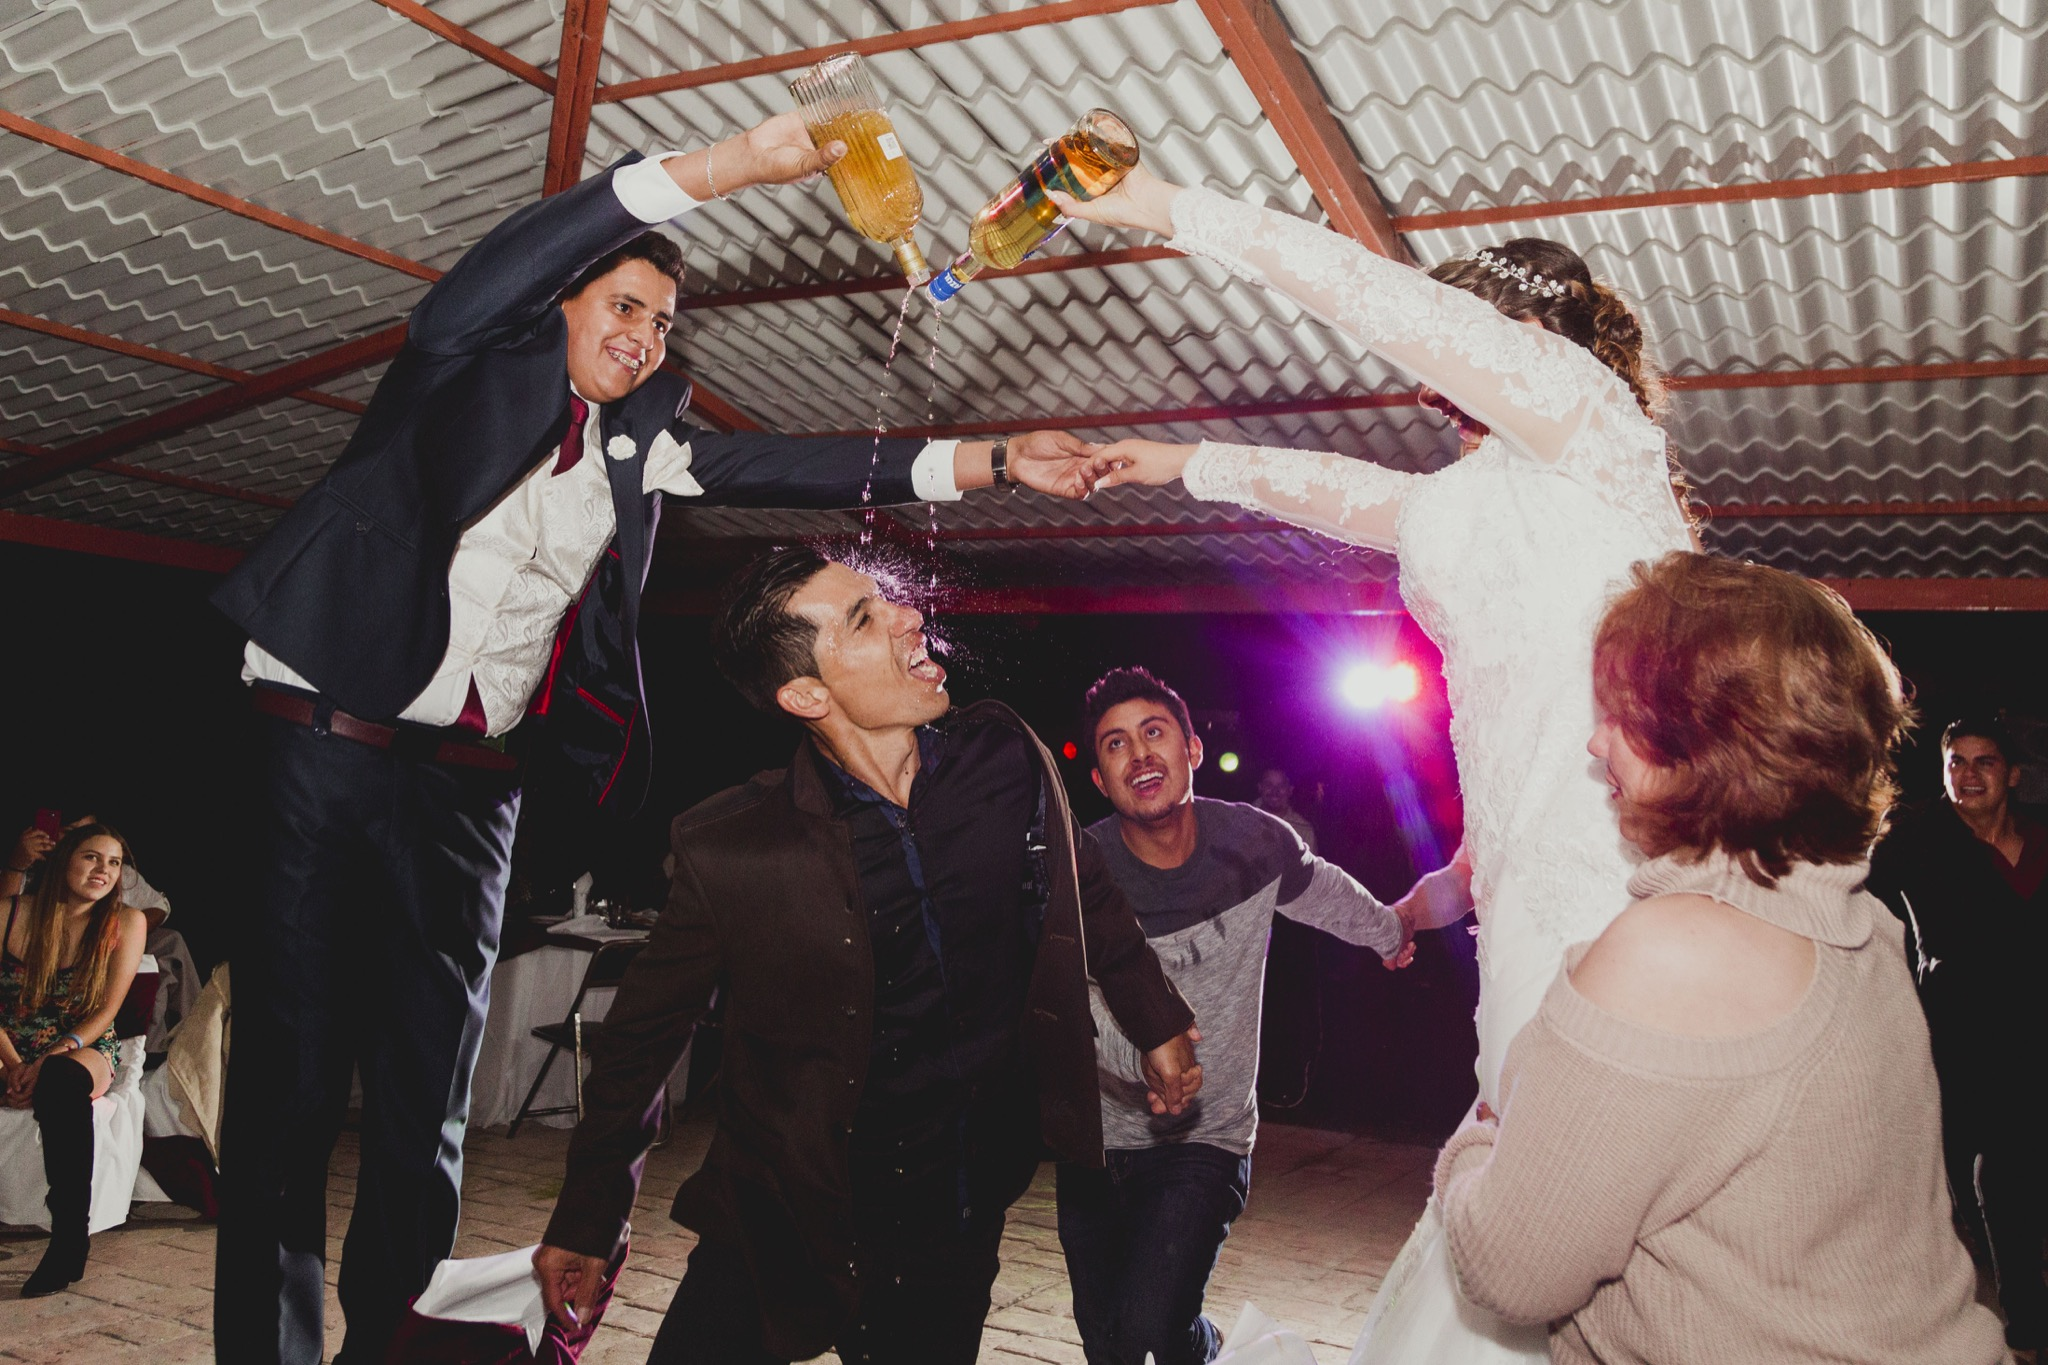 javier_noriega_fotografo_profesional_bodas_zacatecas_mexico_chihuahua_photographer_25